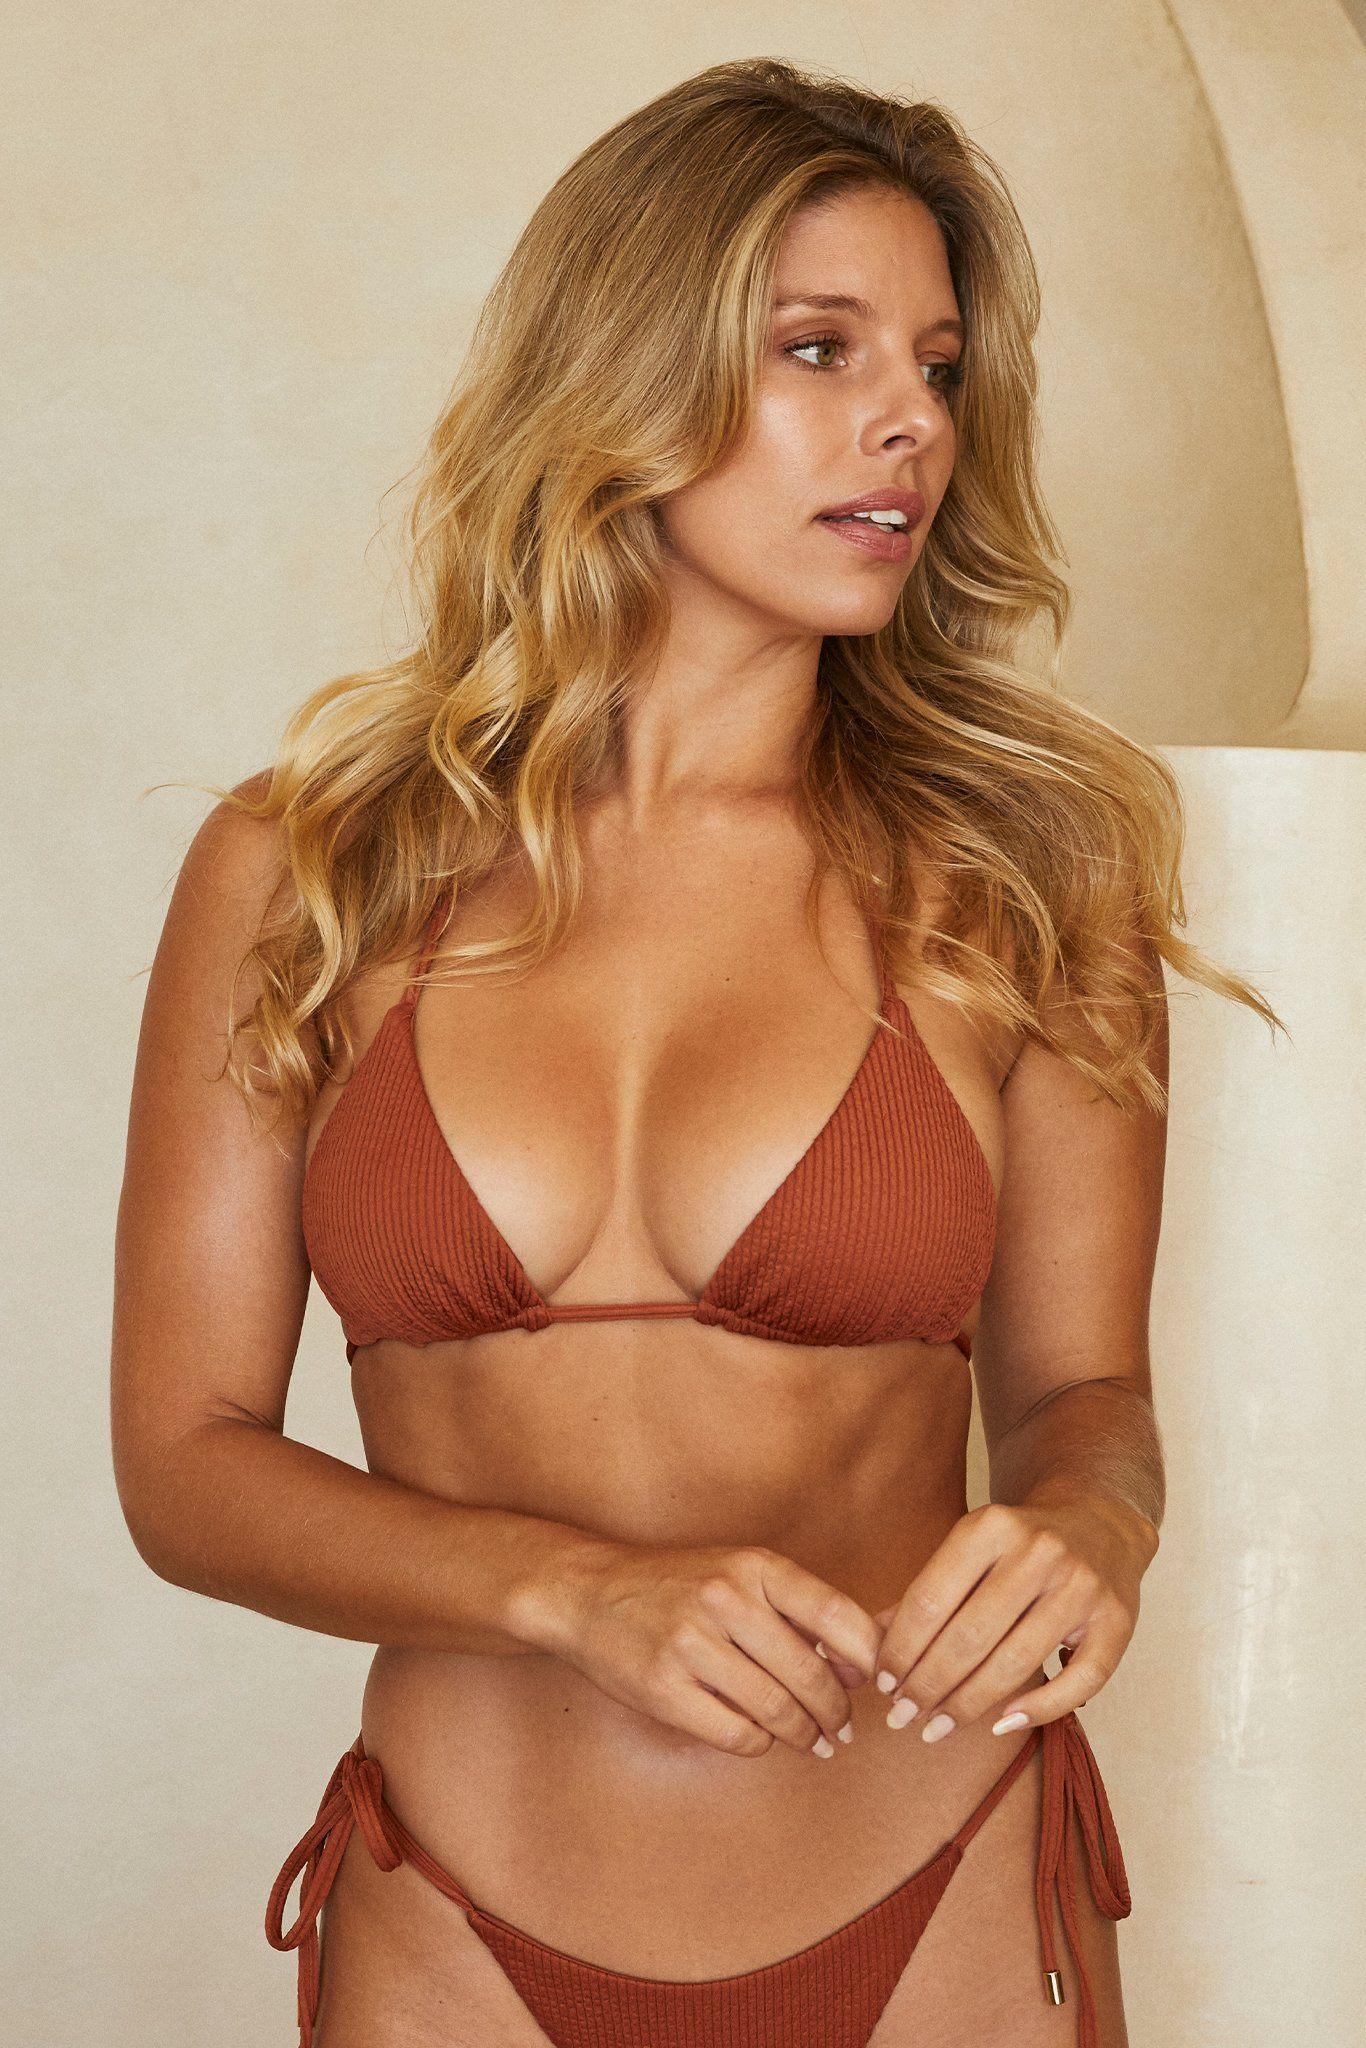 Palma Top by Monday-Swimwear, available on mondayswimwear.com for $79 Natasha Oakley Top Exact Product